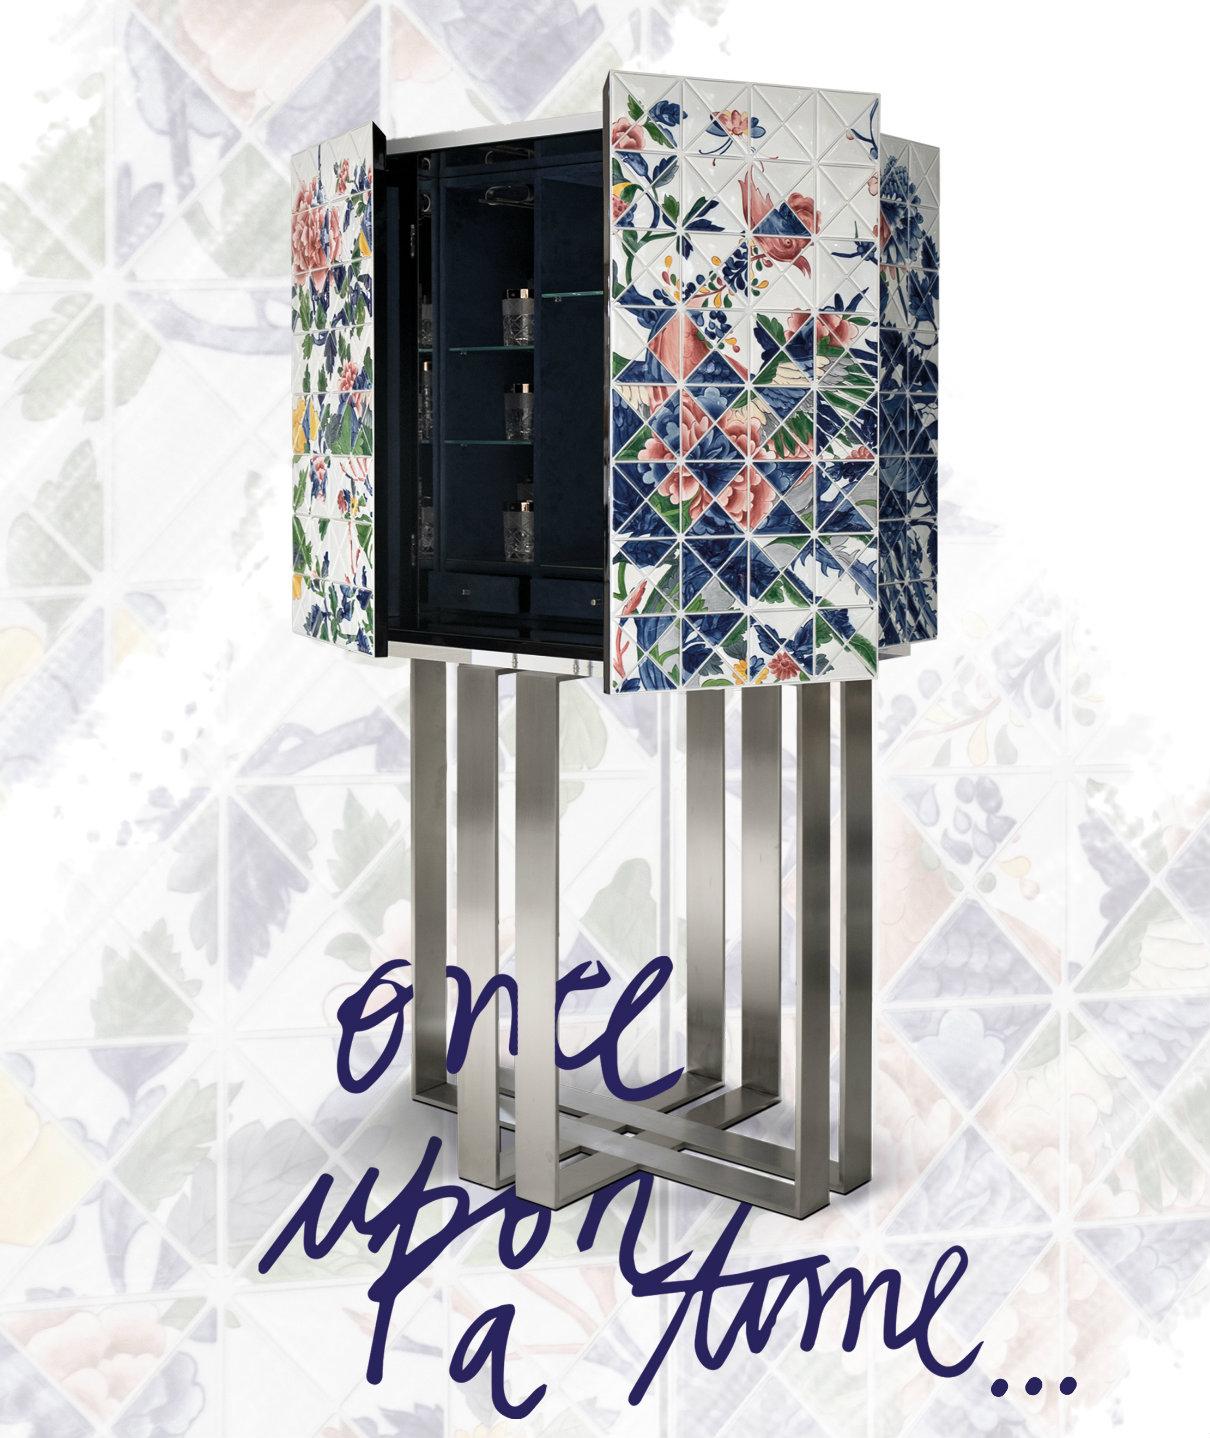 new design concept Discover The New Design Concept Piece by Boca do Lobo and Vista Alegre adv boca do lobo with partnership vista alegre